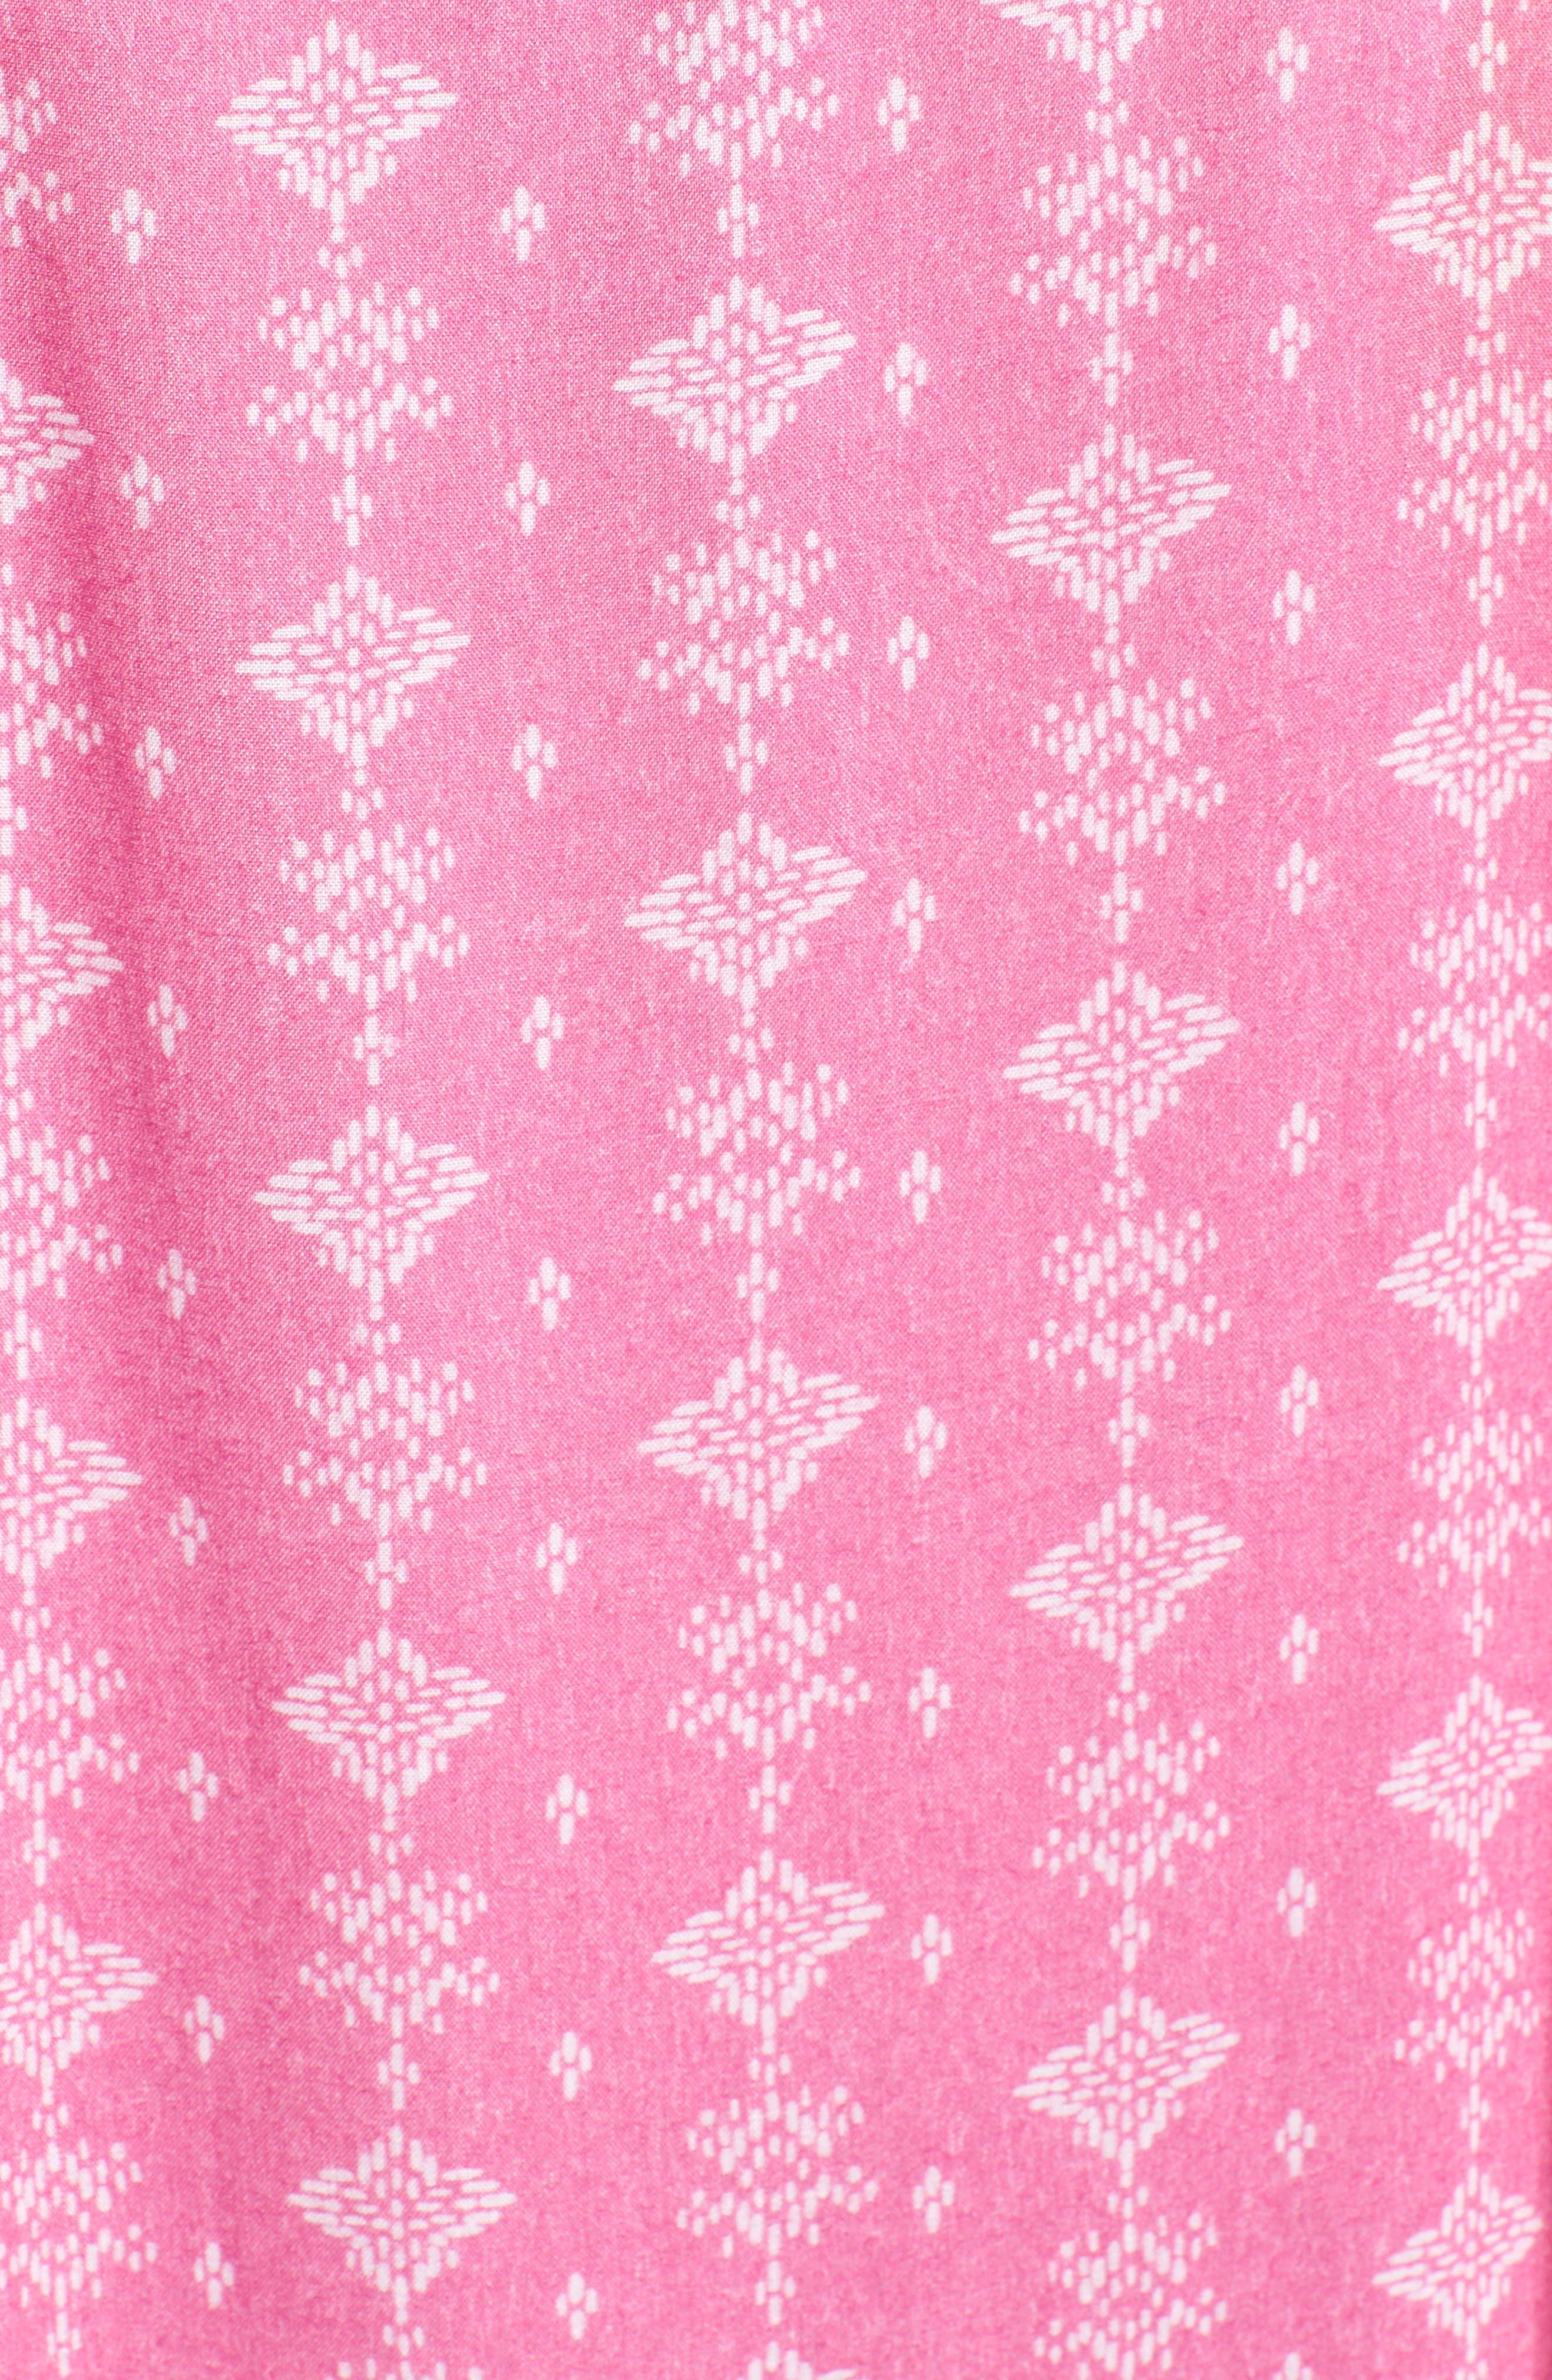 Caslon Batik Stamp Poncho,                             Alternate thumbnail 5, color,                             Pink Island Stamp Print